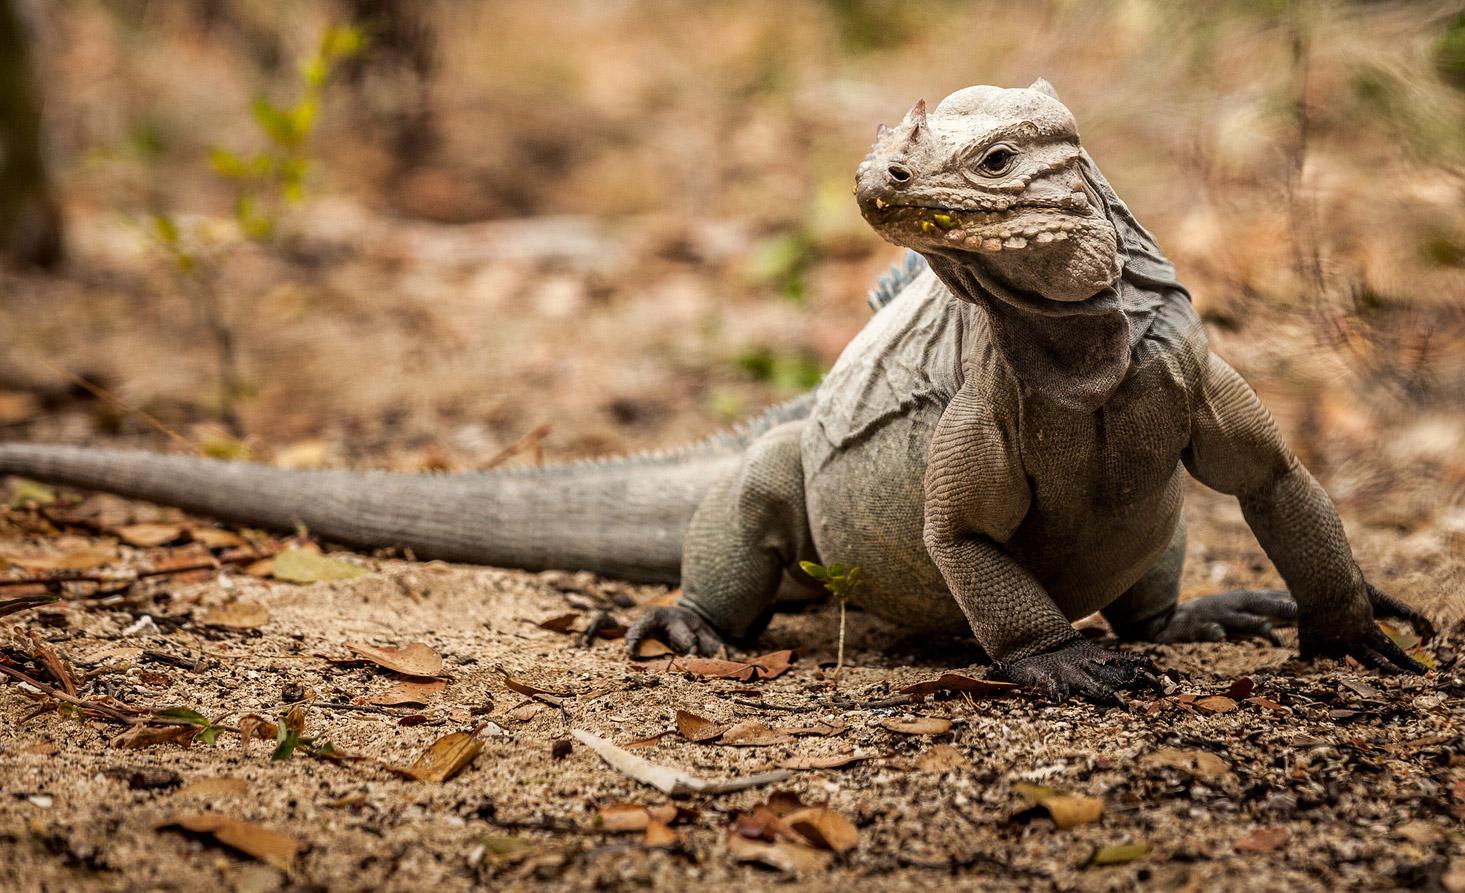 Island Conservation rhinoceros iguana cabritos island dominican republic - Francisco Javier Tadeo Domínguez Britto